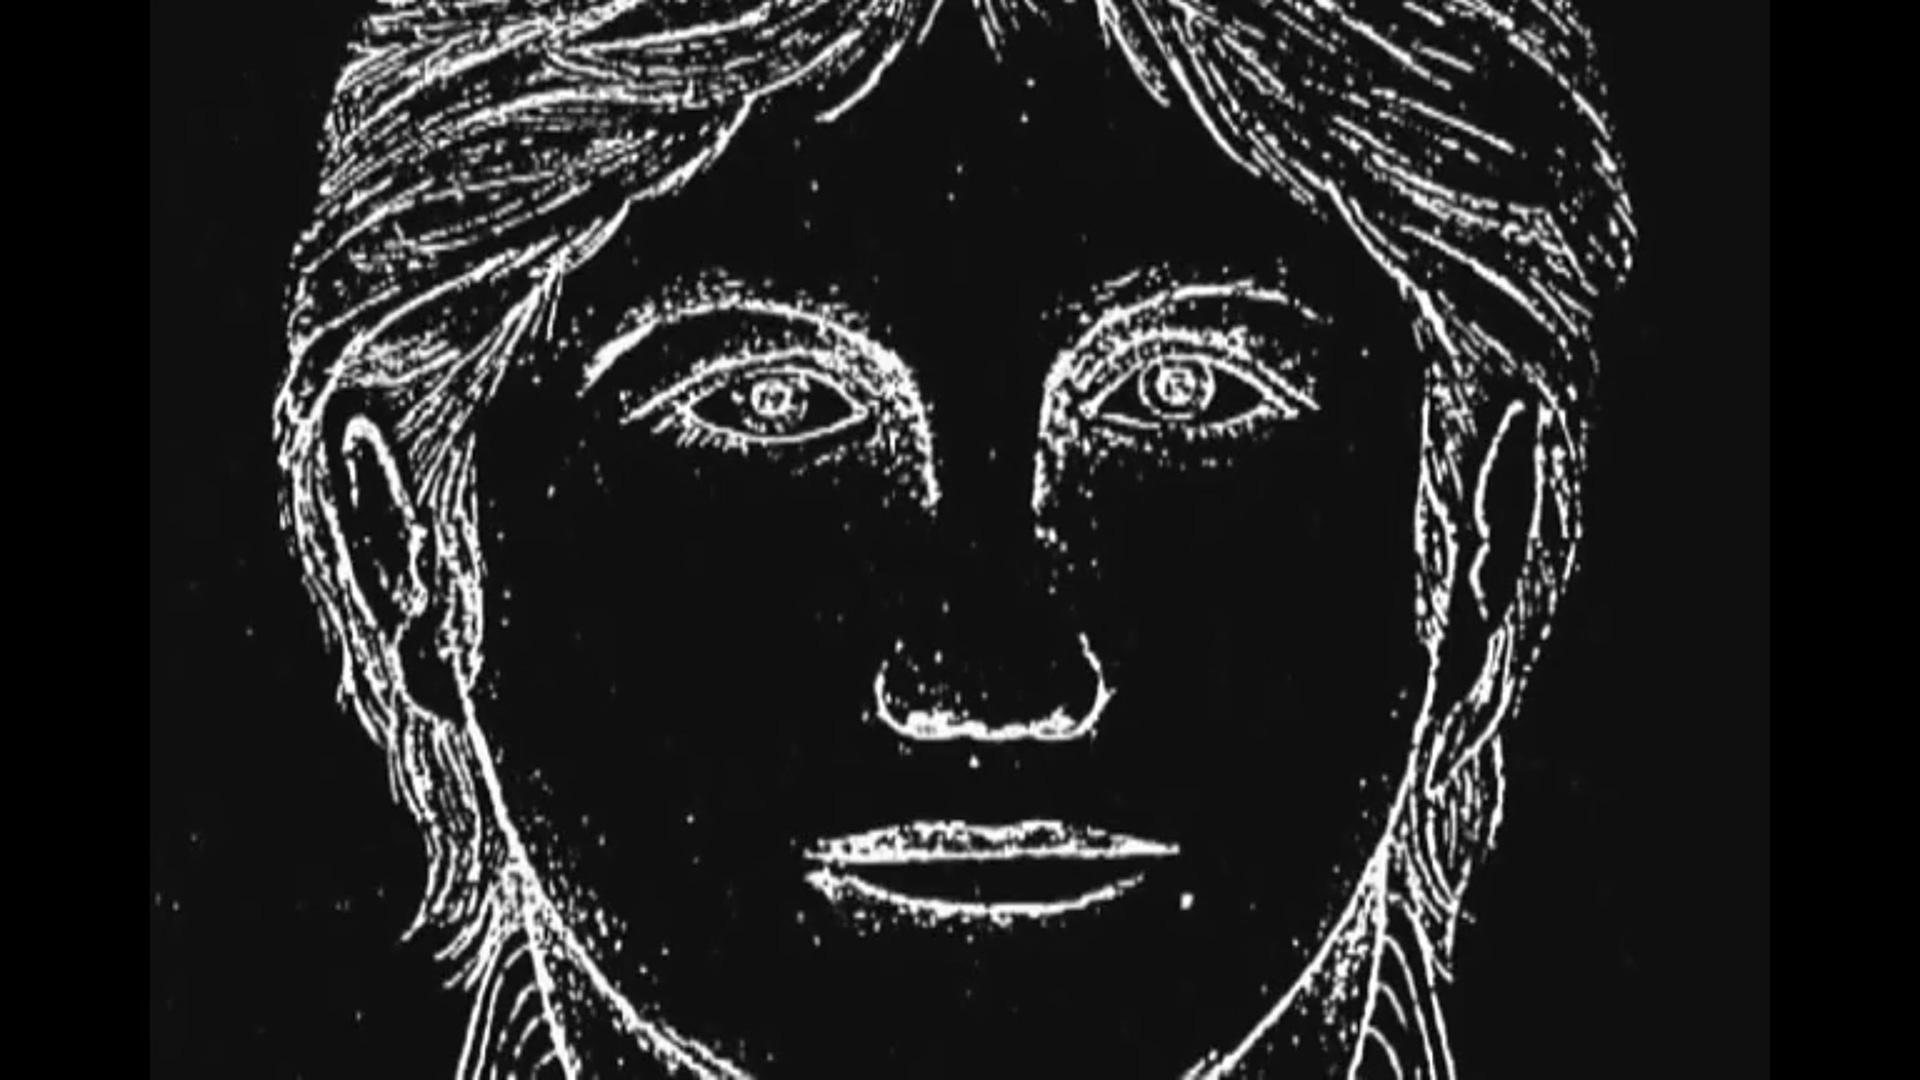 Cold Case Files Classic, The Original Nightstalker